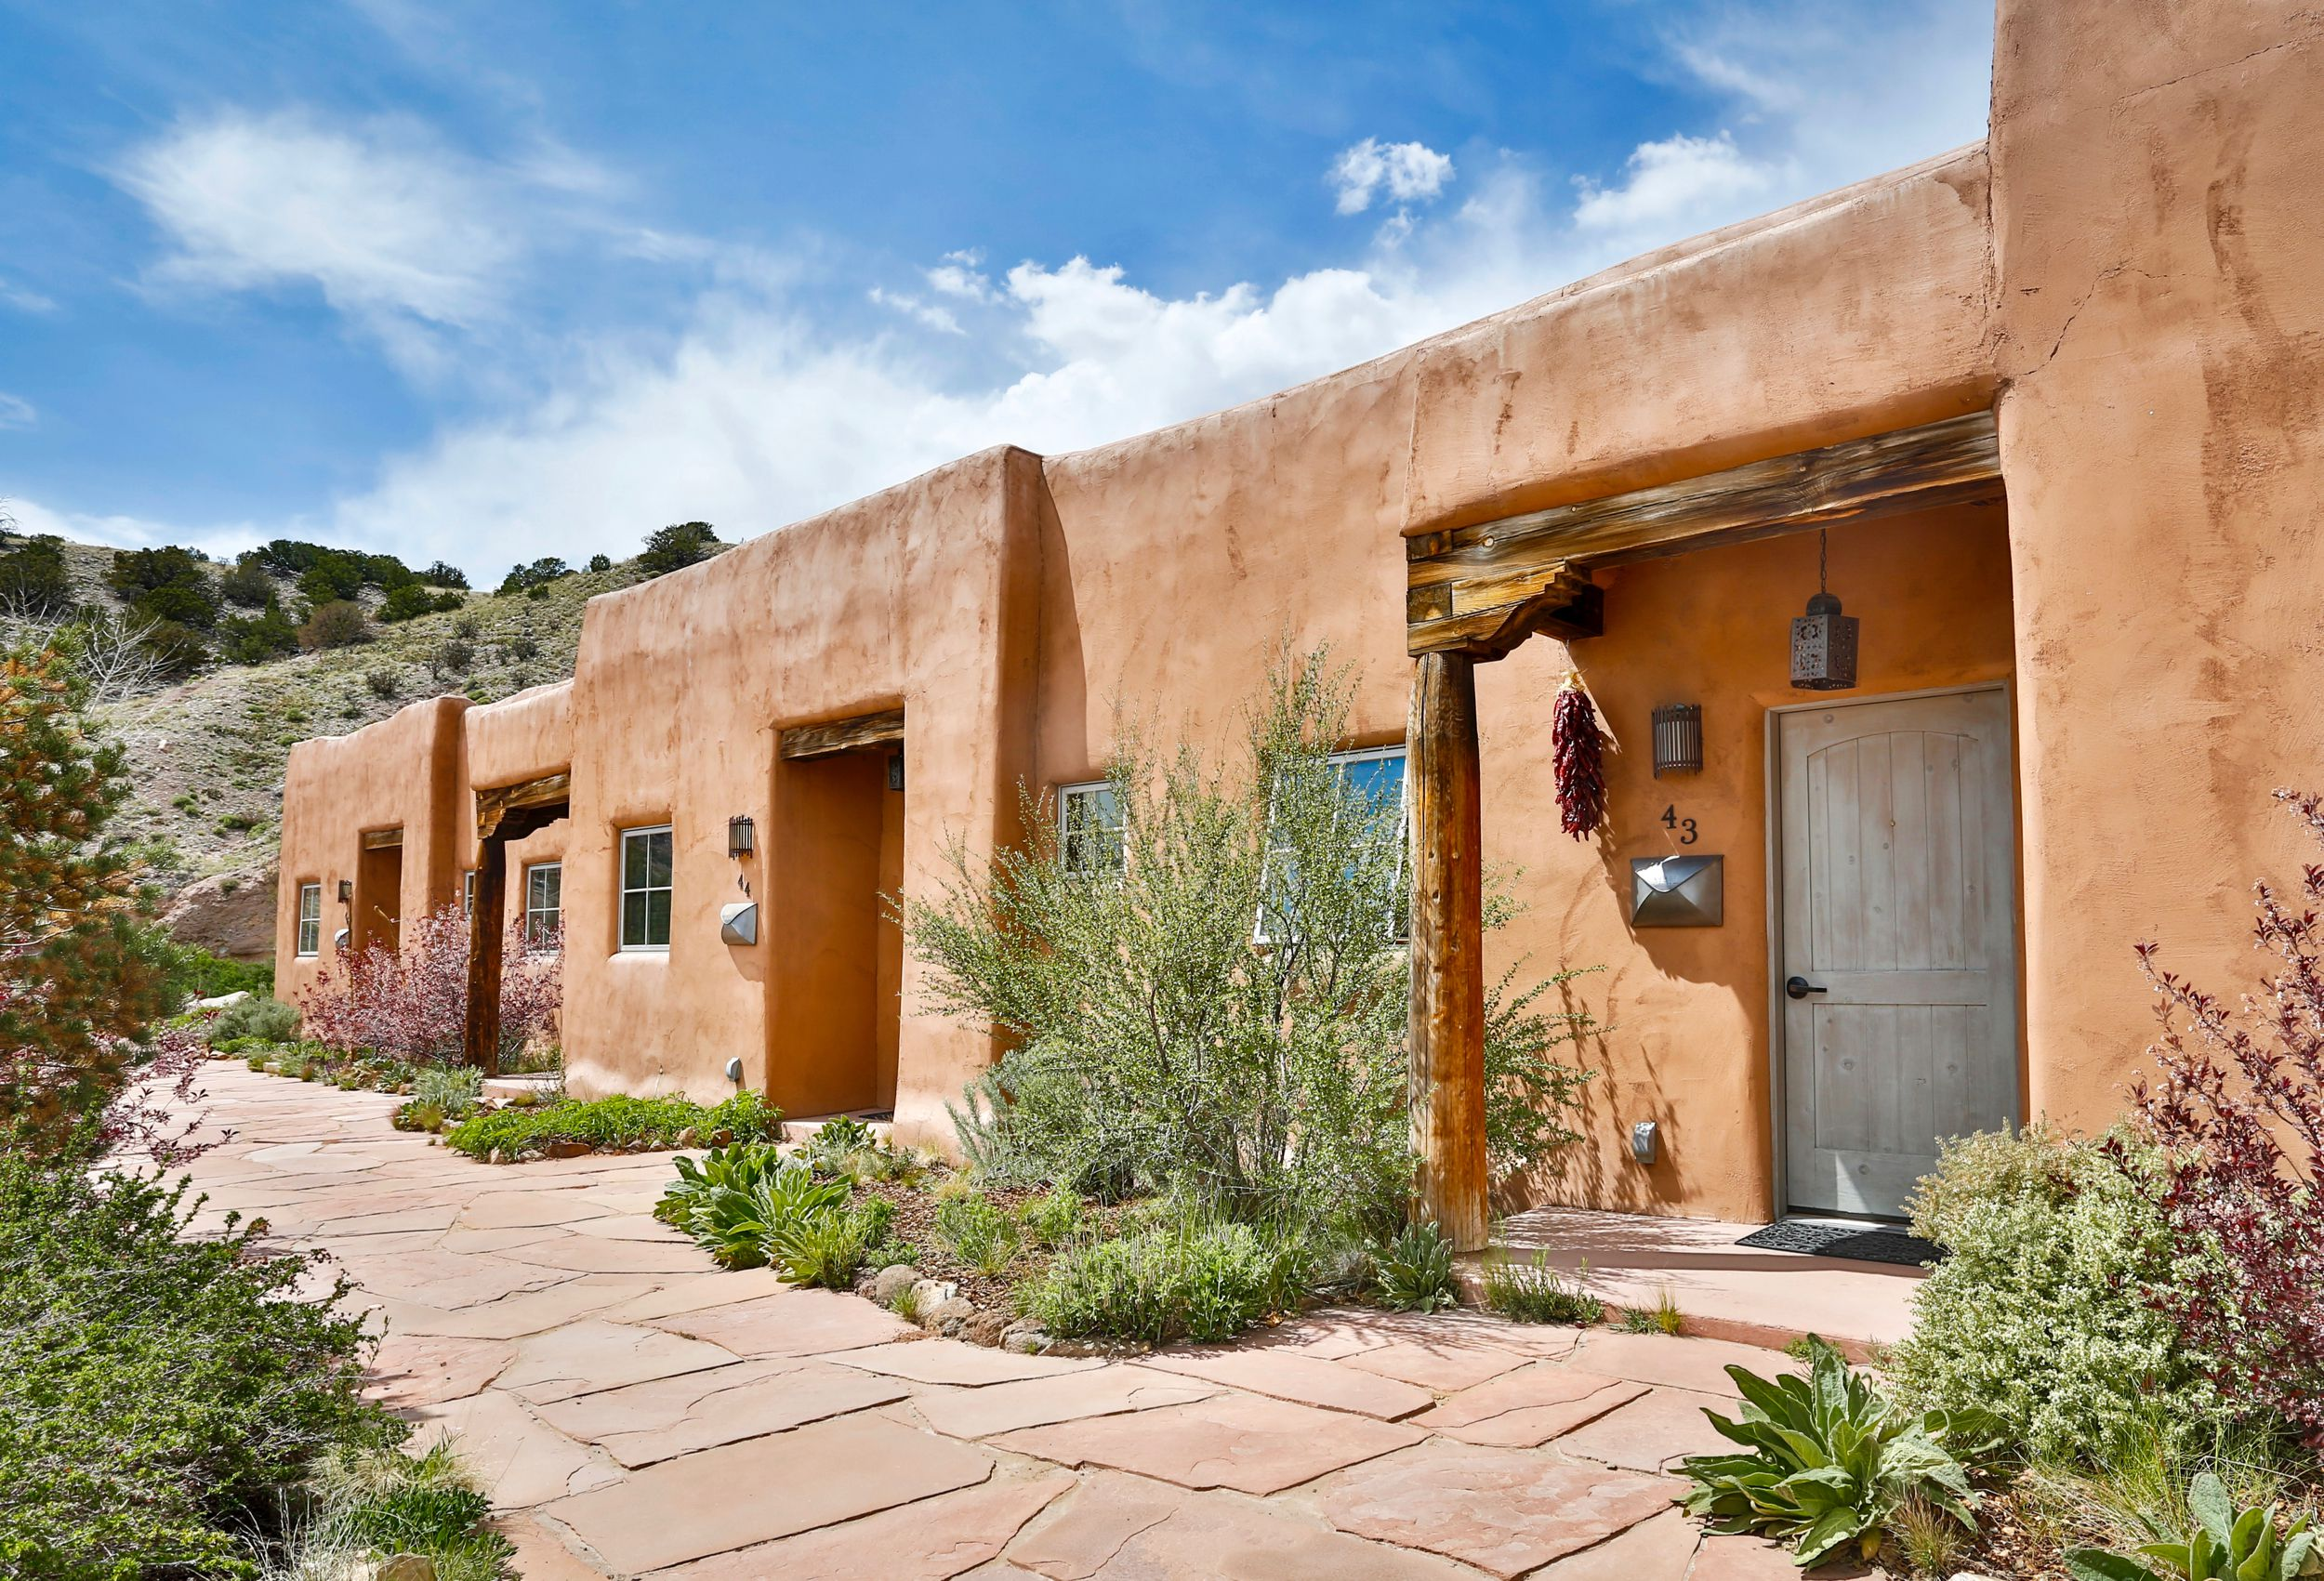 Ojo Caliente Spa Mineral Hot Springs New Mexico